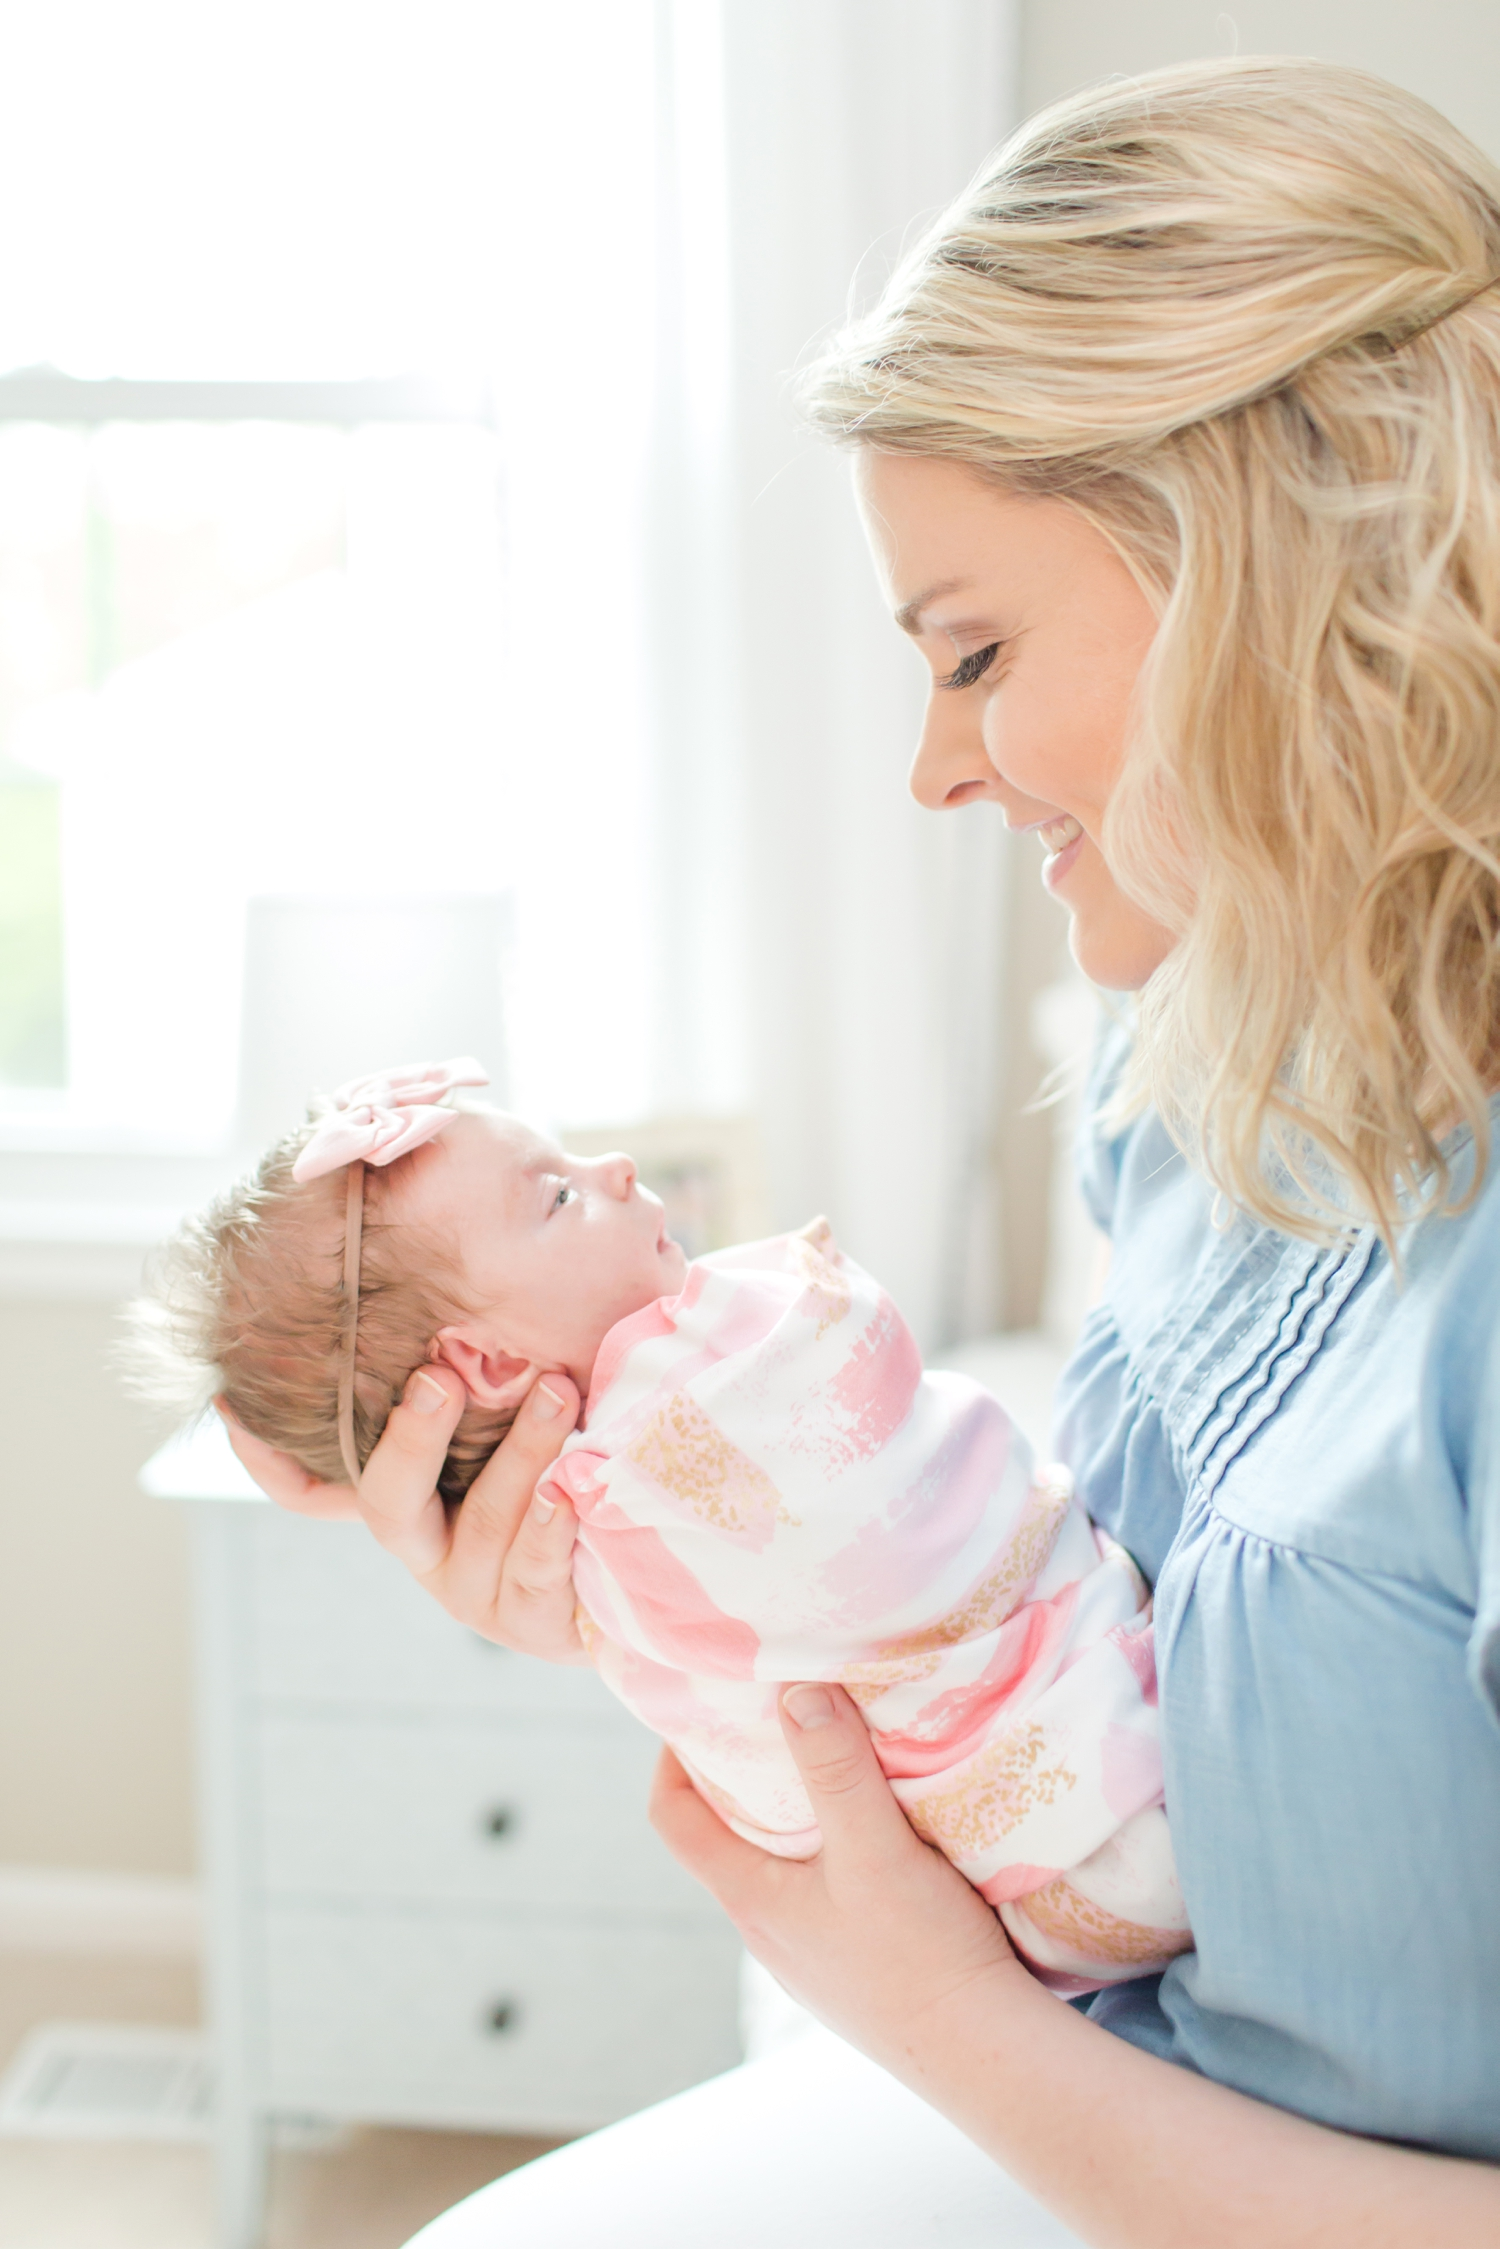 Miano Newborn-30_anna grace photography newborn photography baltimore maryland newborn and family photographer photo.jpg